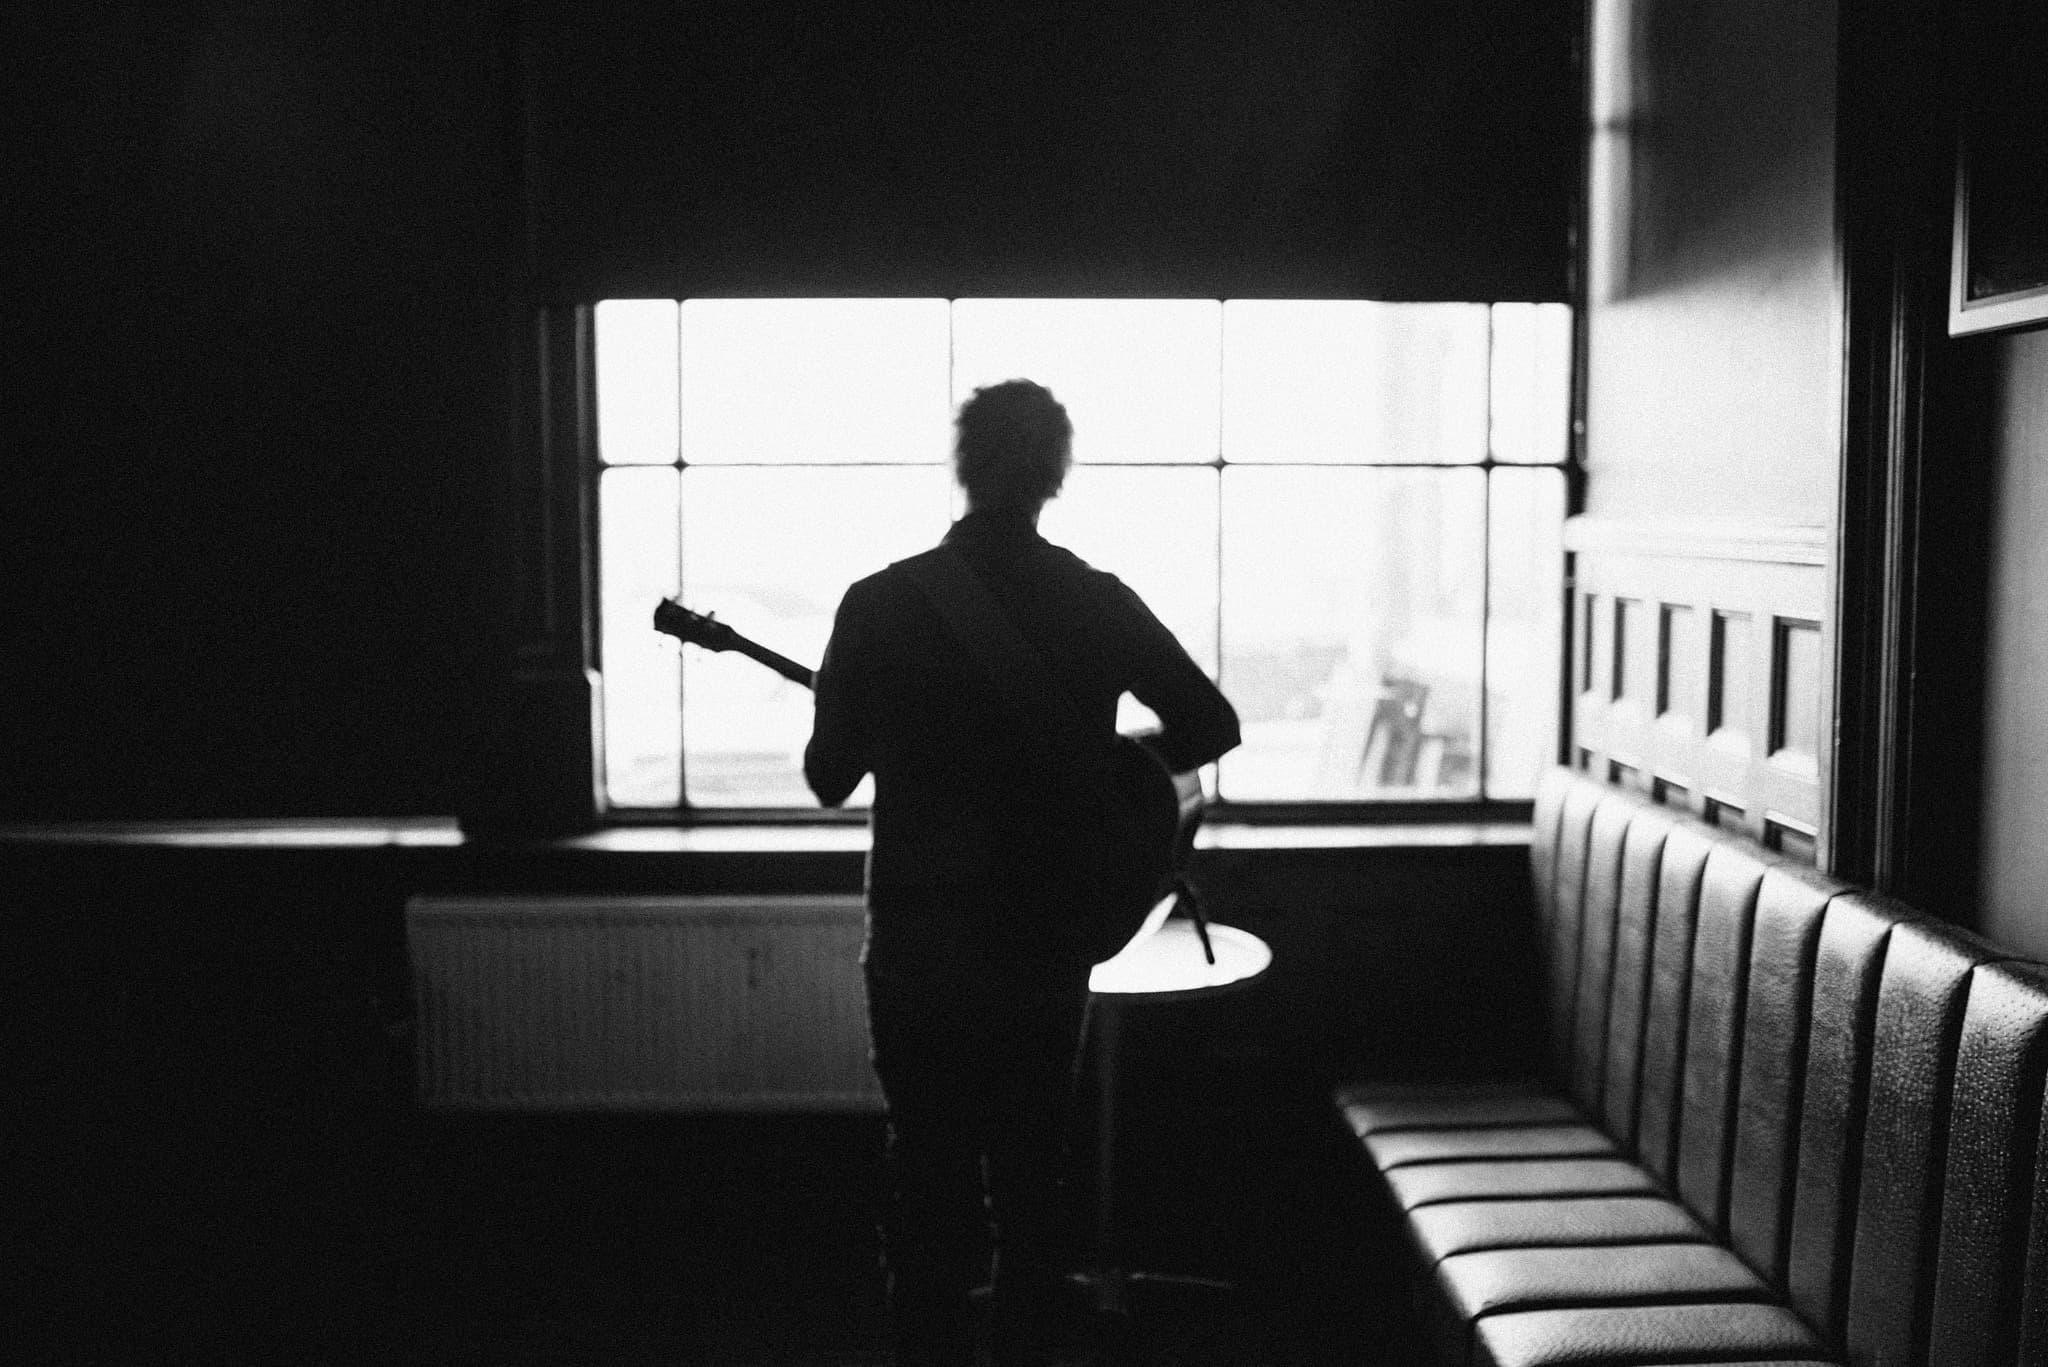 """Wonderwall"" Hauntingly Reimagined By Singer/Songwriter Chris Simmons"